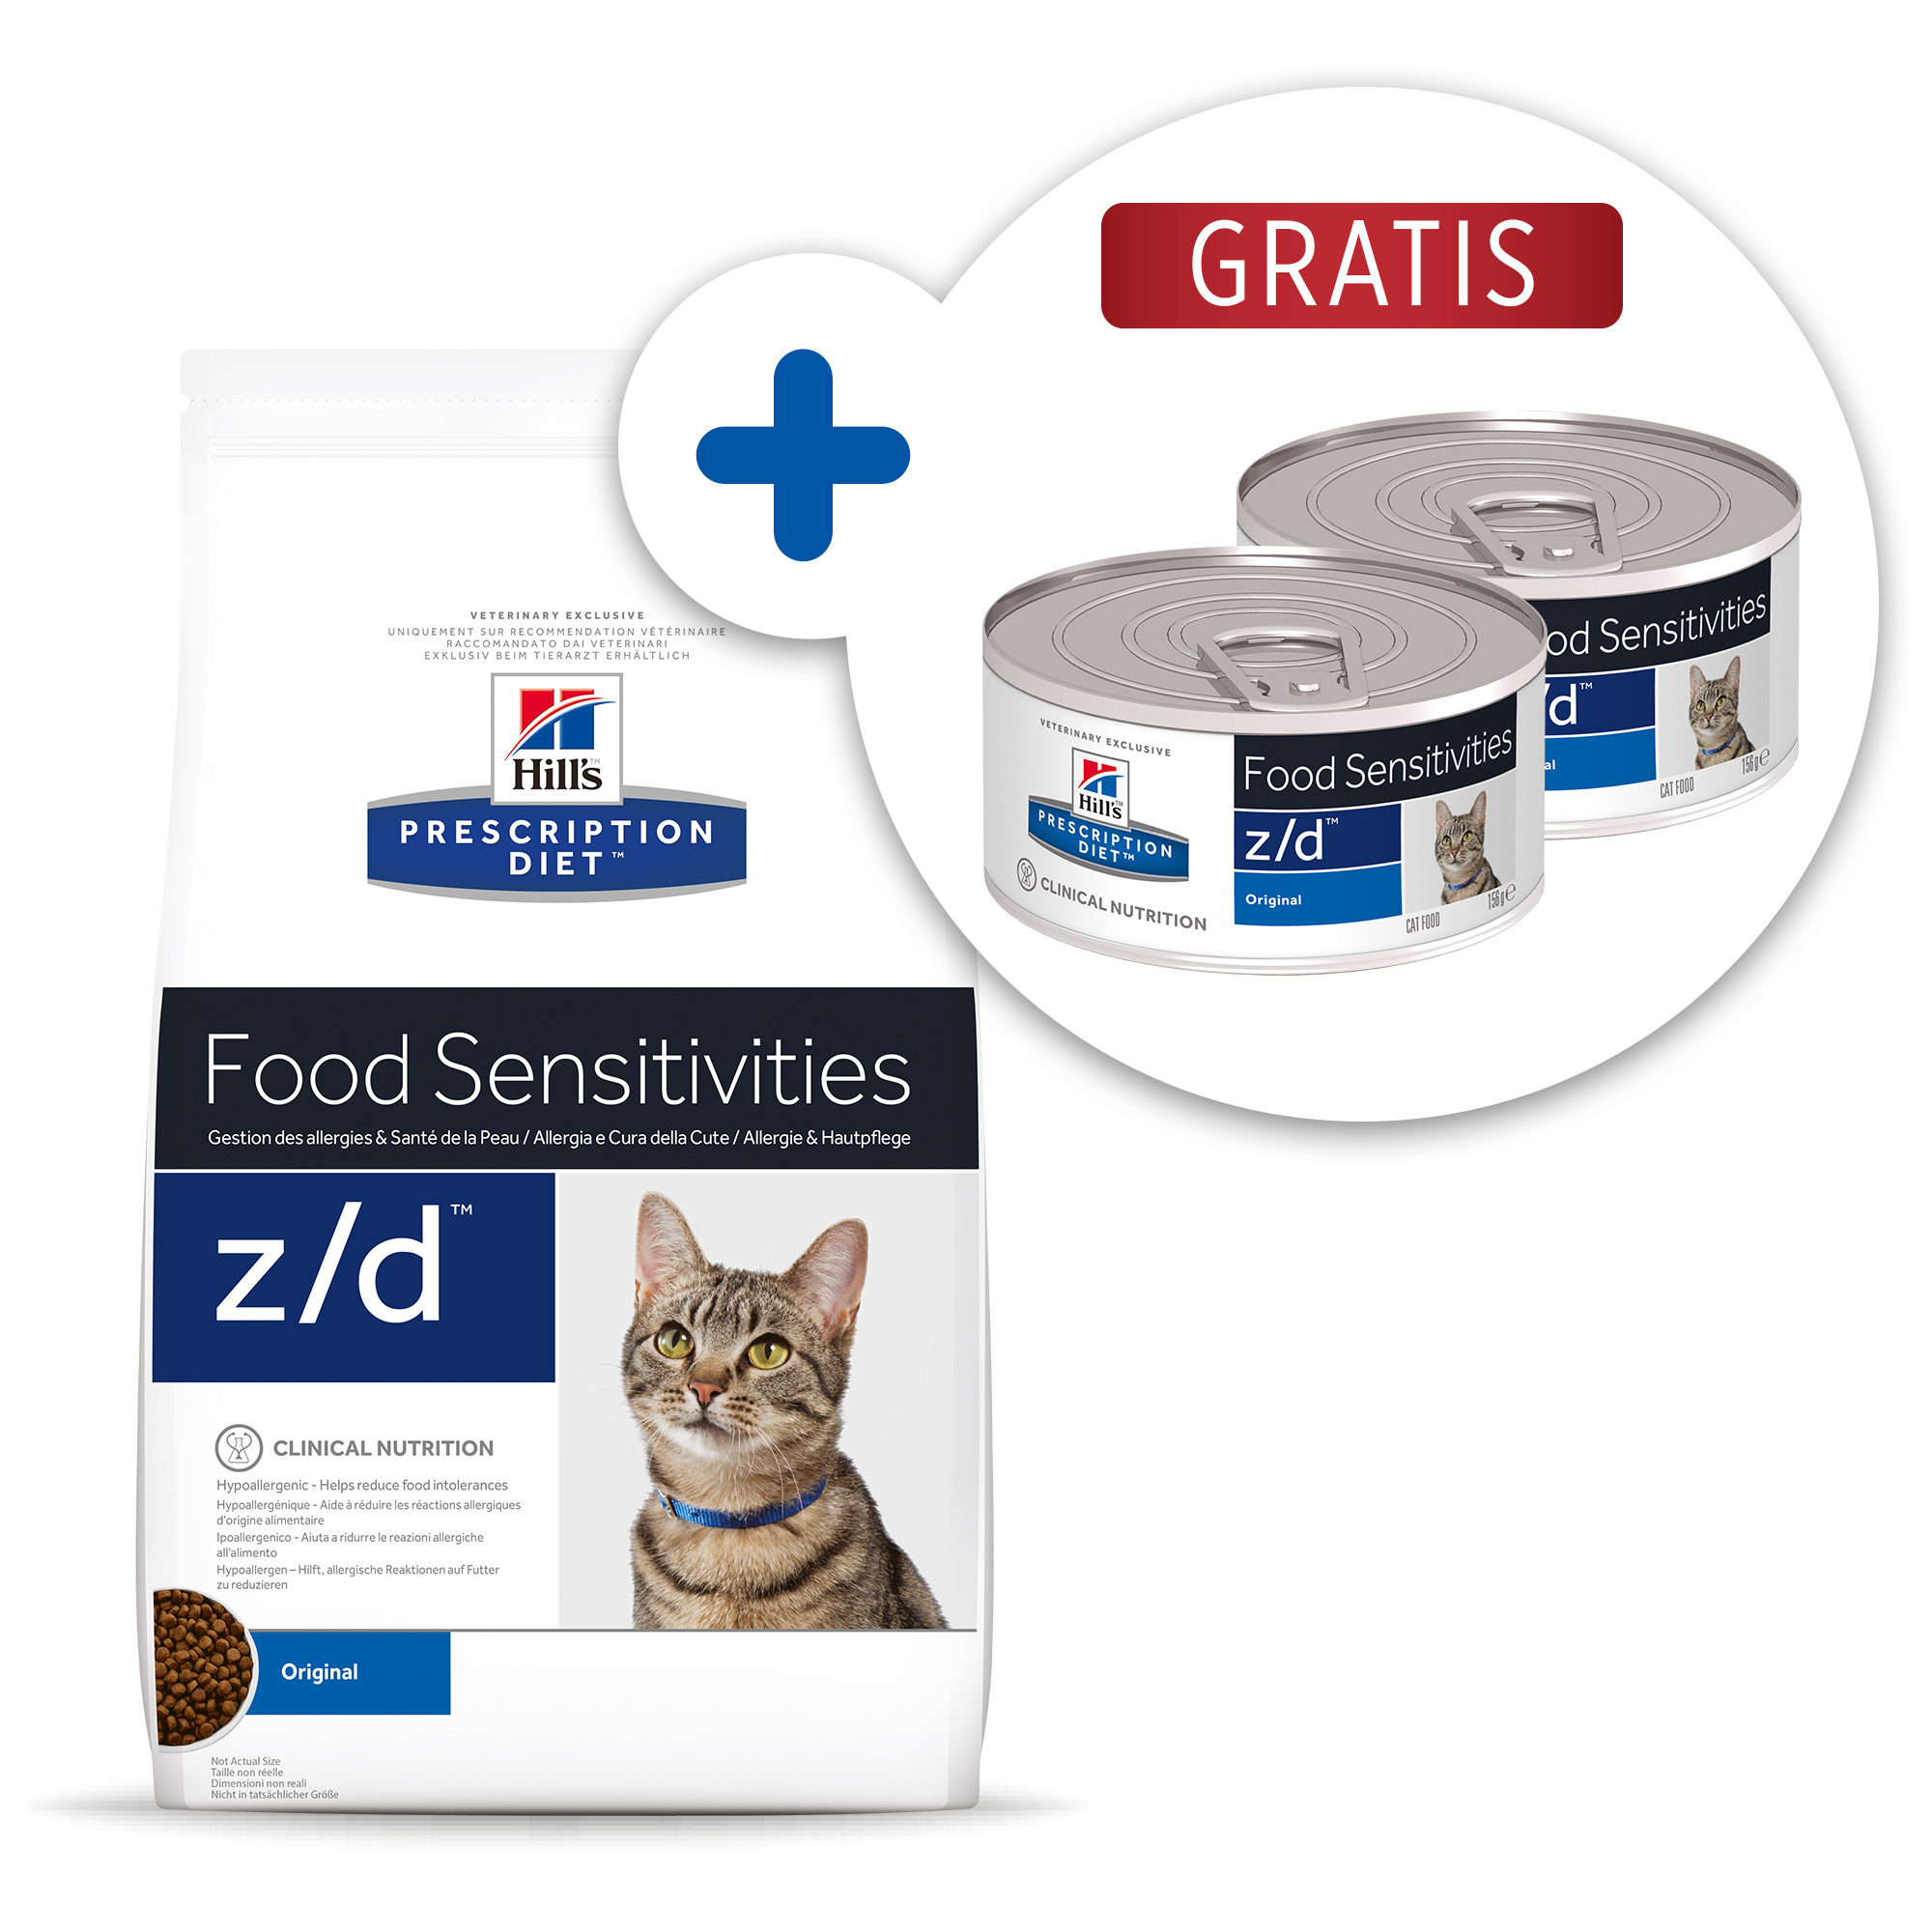 Hill's Prescription Diet z/d Food Sensitivitie Katzenfutter - Dosen